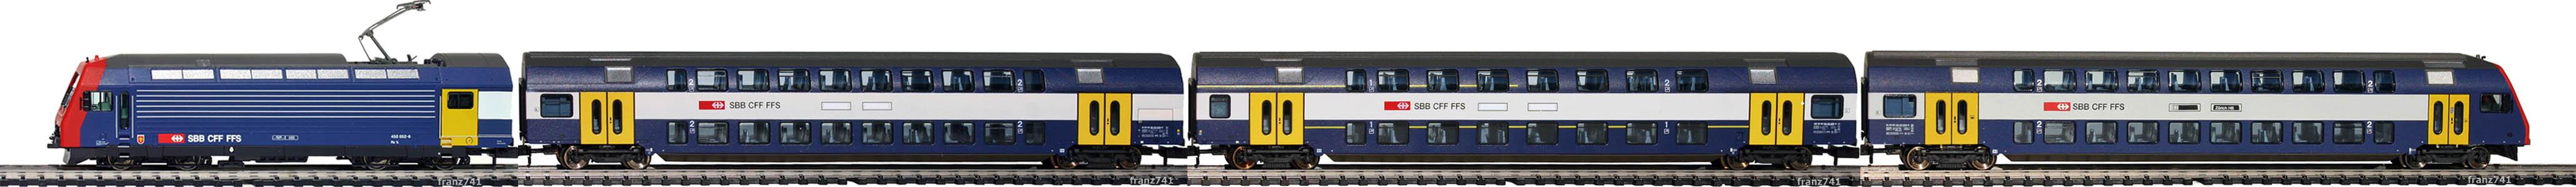 Epoche-V-SBB-Zugskomposition-S-Bahn-Doppelstock-Personenwagen_1